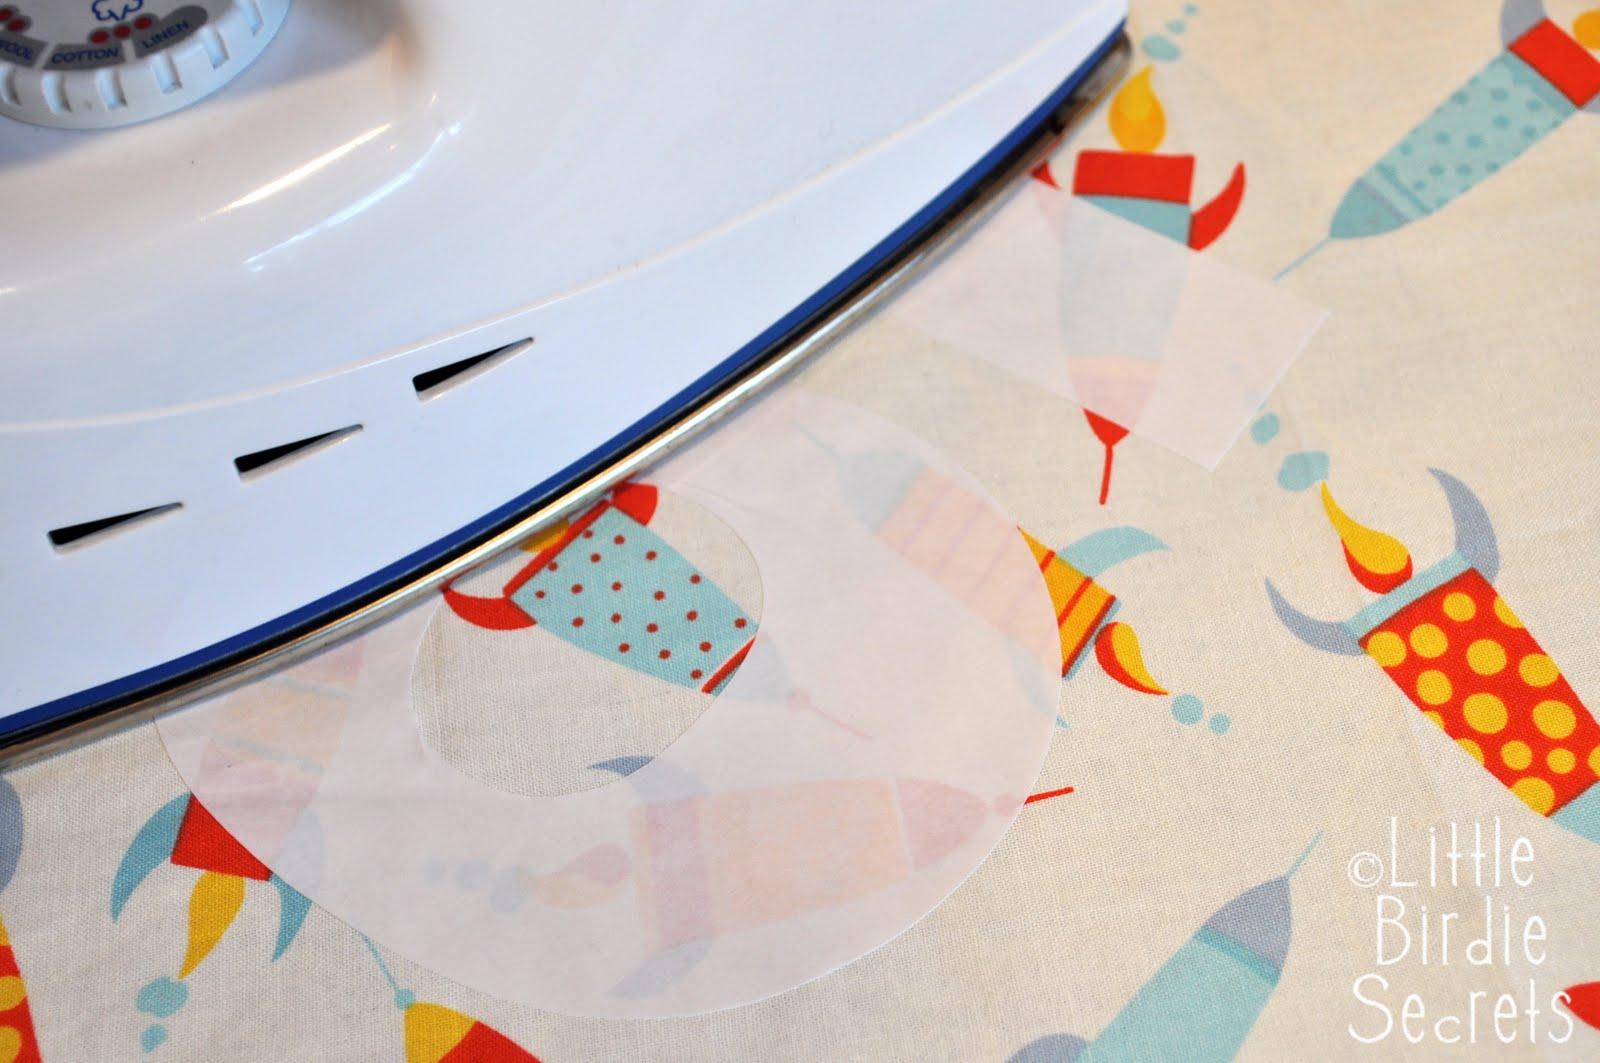 freezer paper applique template tutorial {why we love freezer paper} Little Birdie Secrets